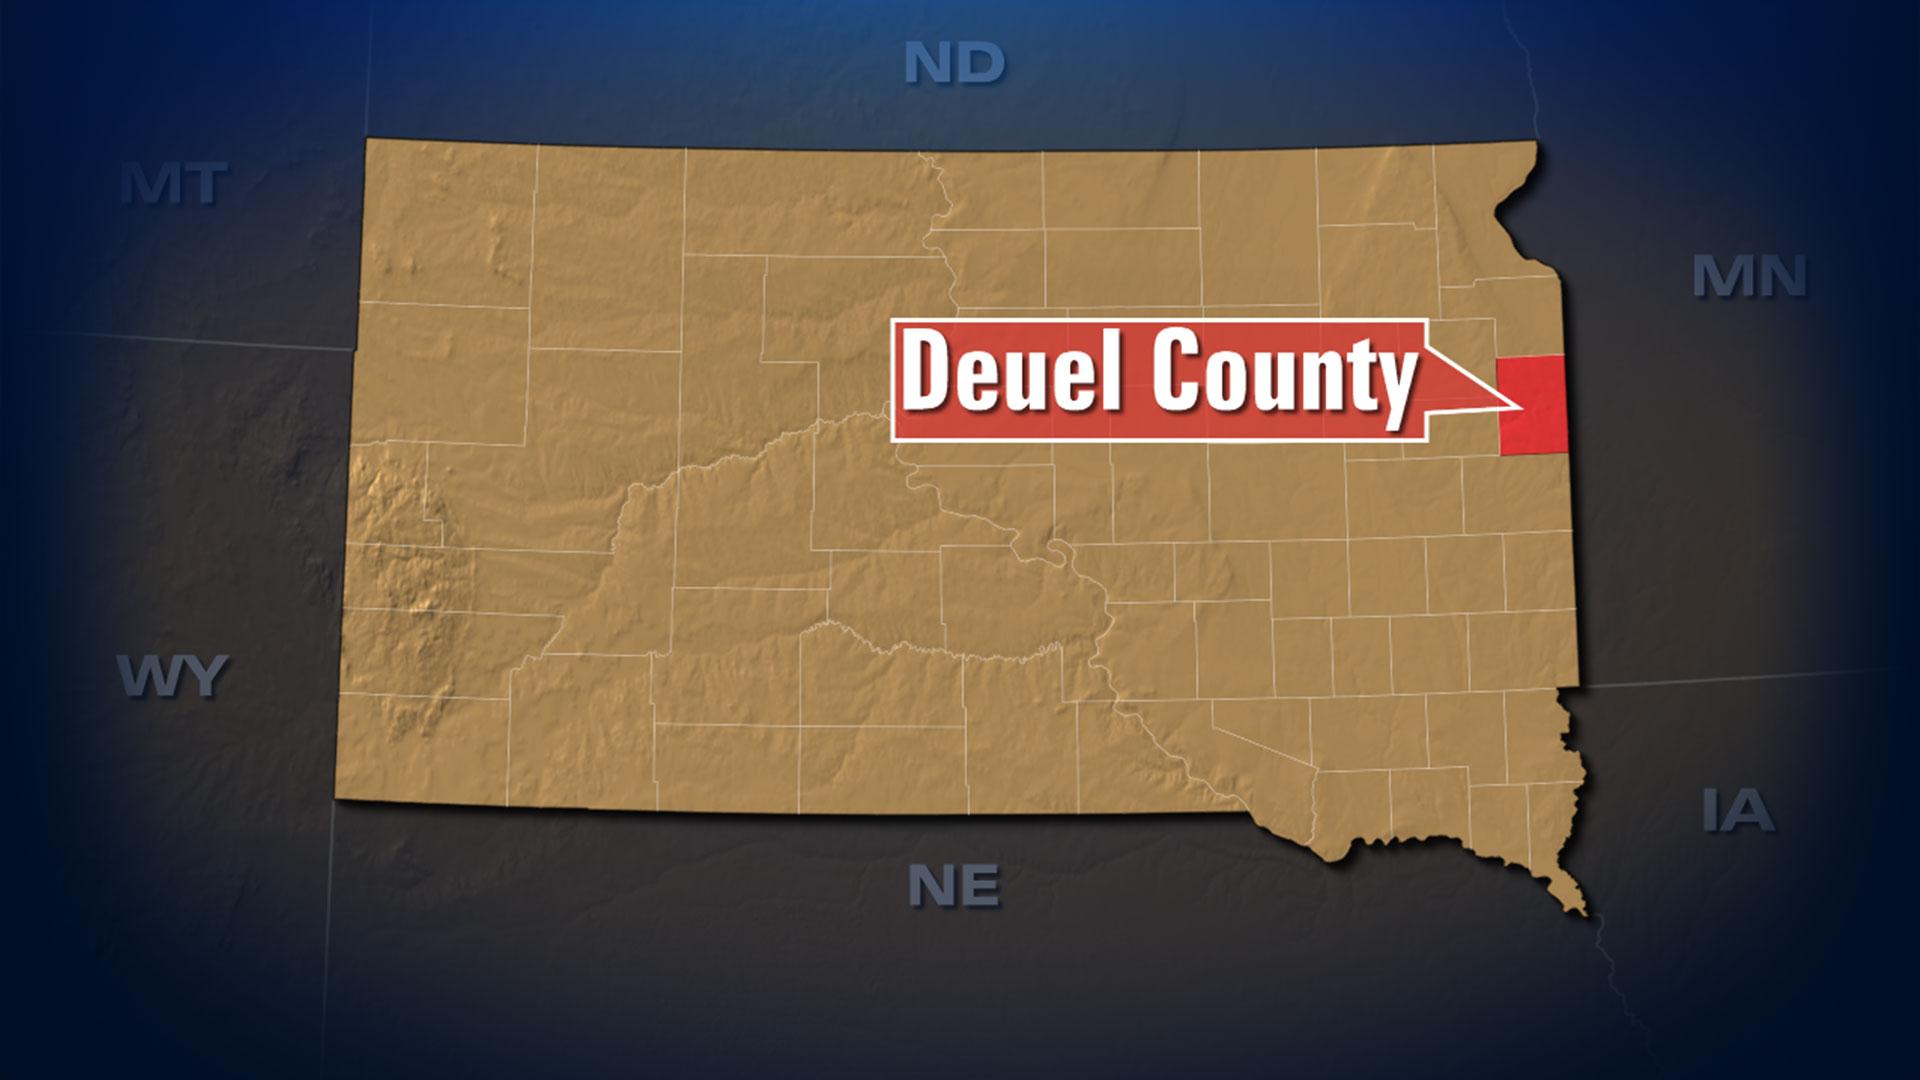 KELO Deuel County